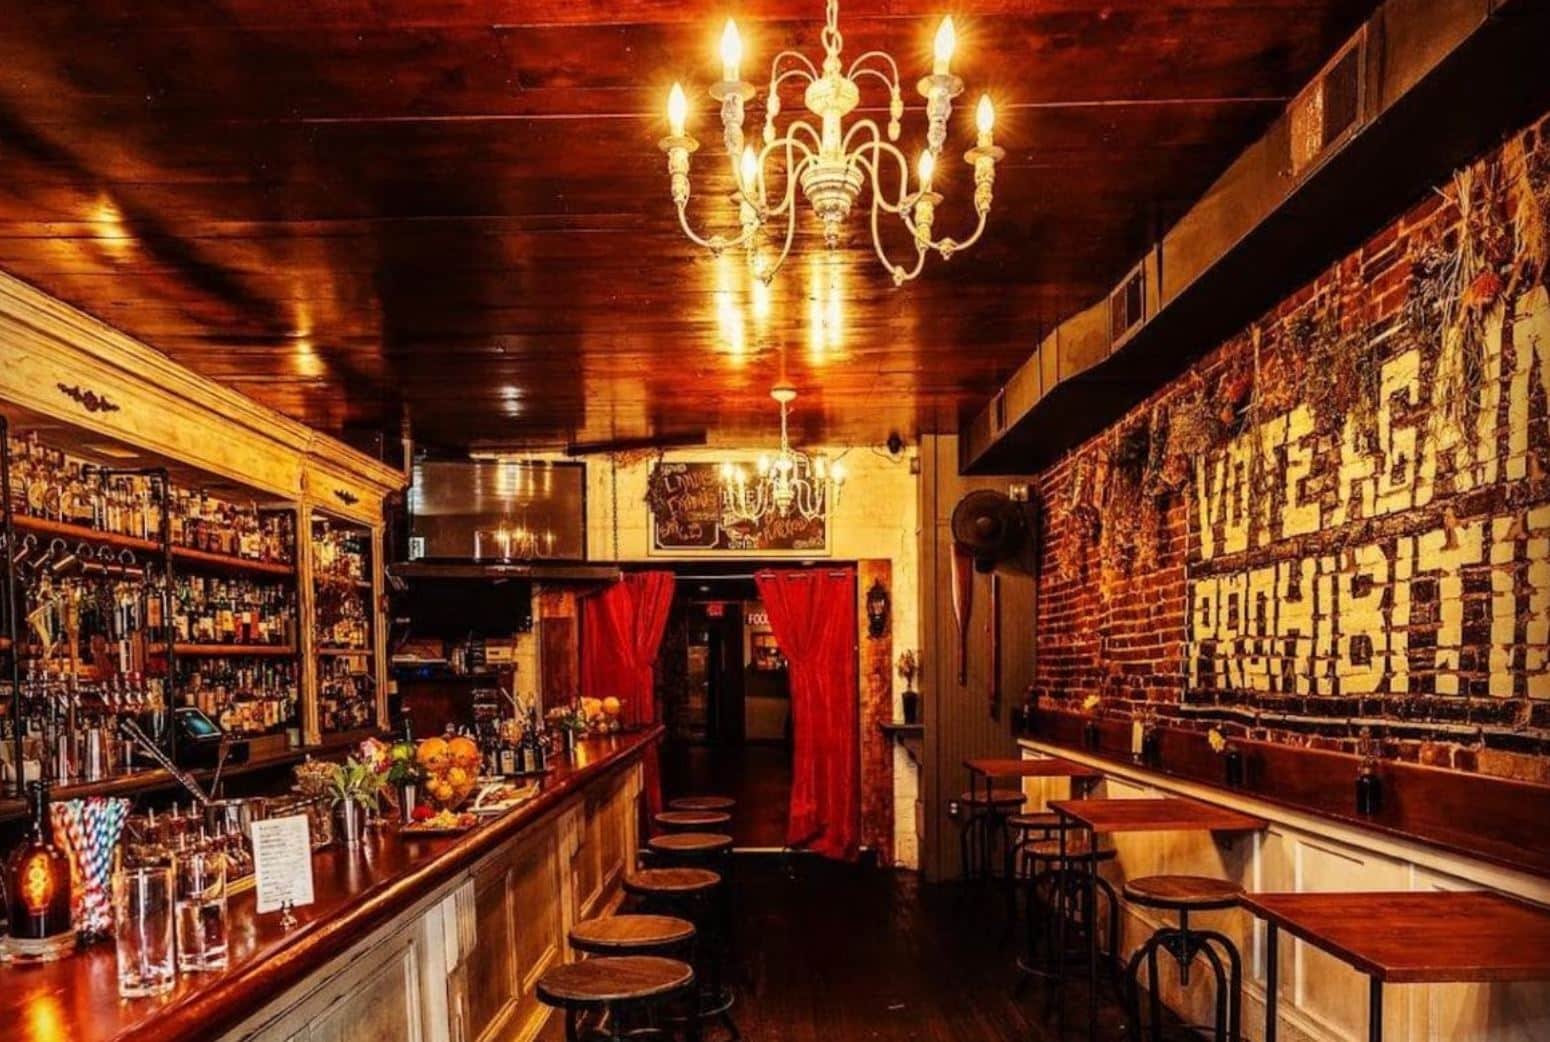 Rye Bar in Baltimore